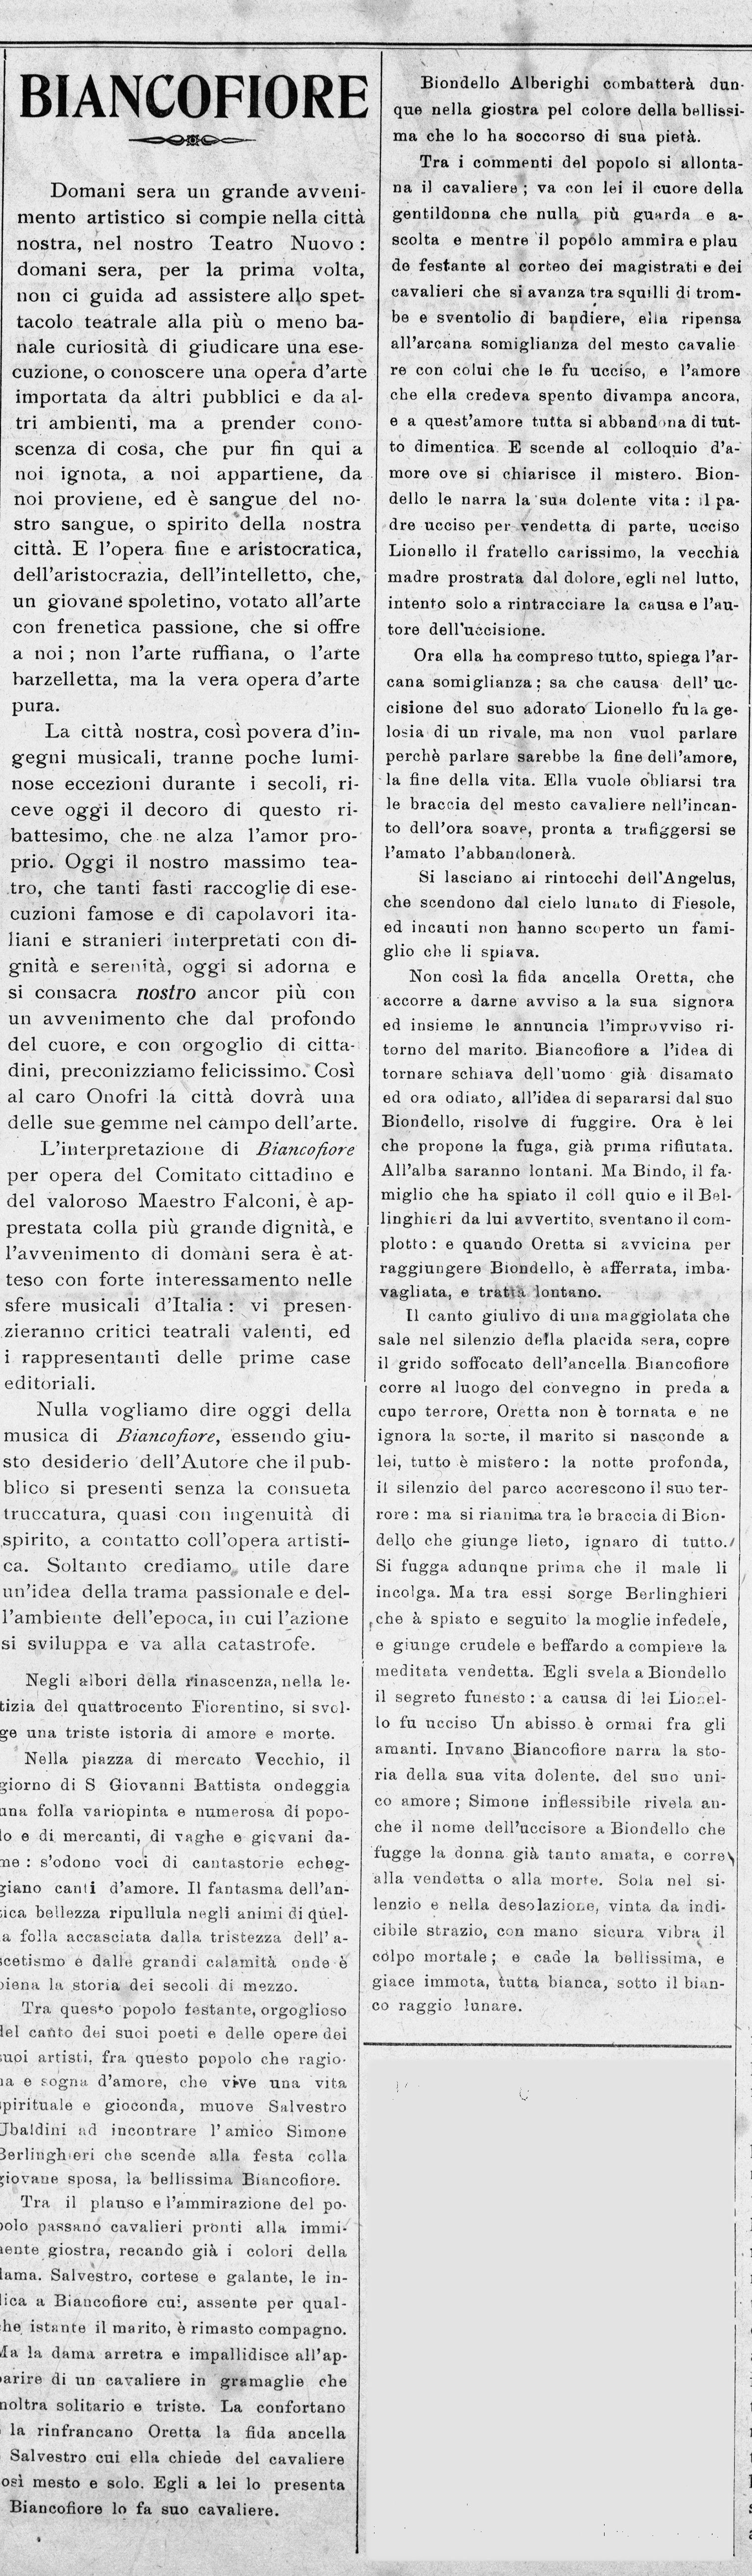 Giovane Umbria   13 agosto 1911